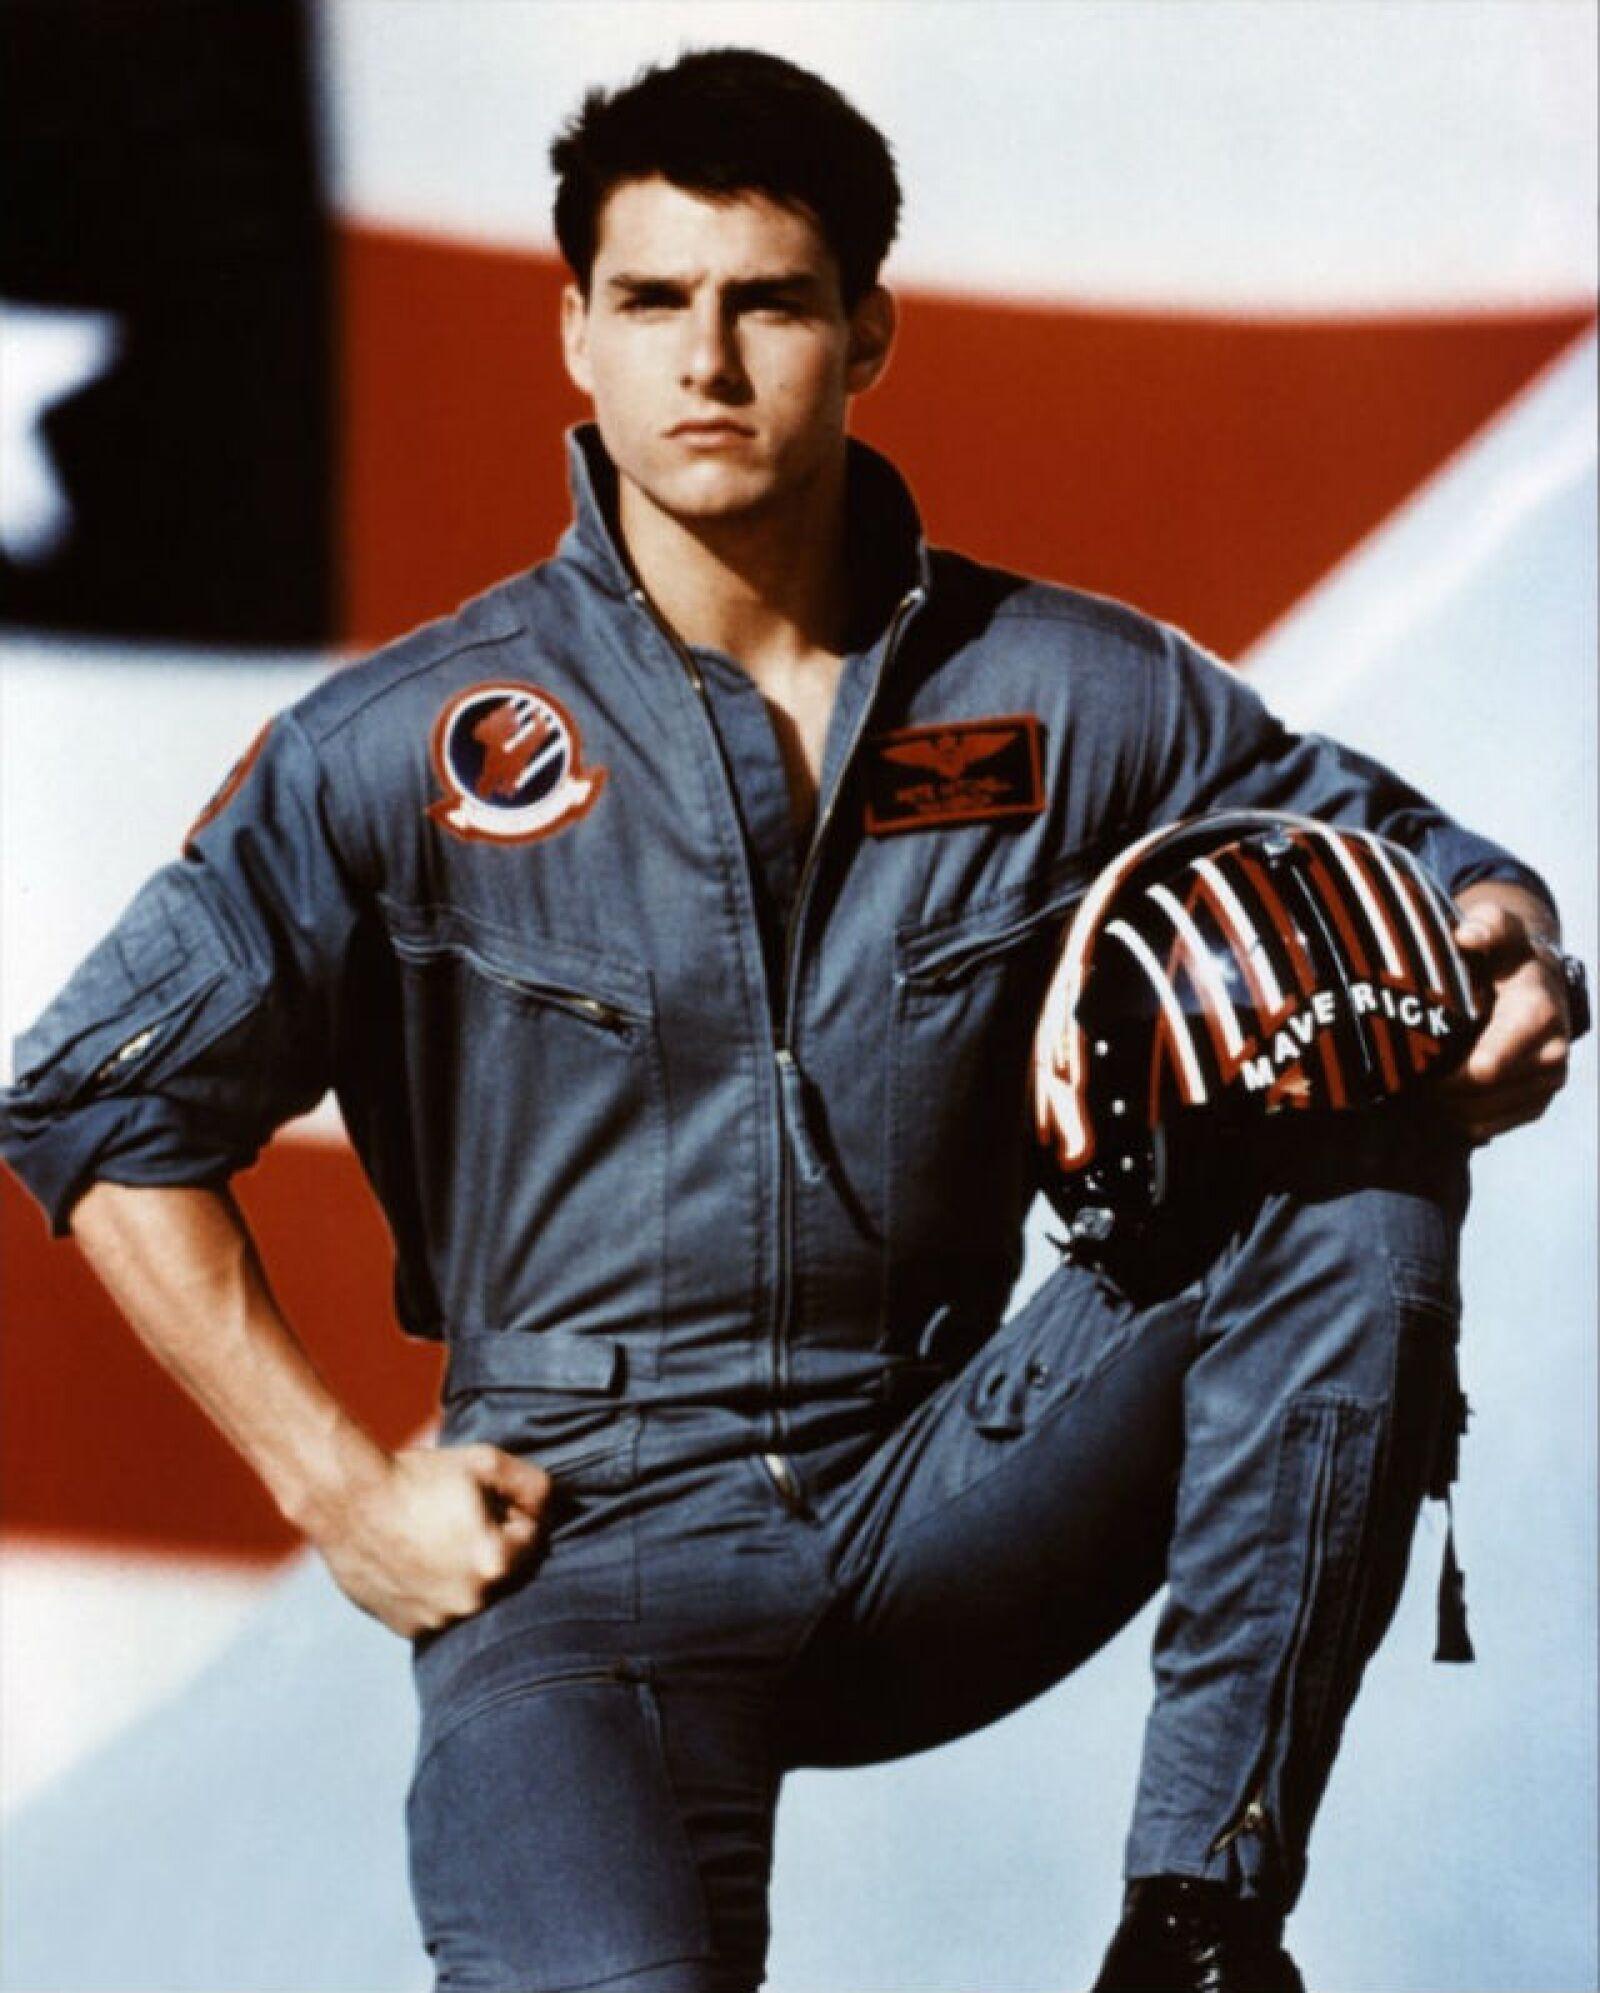 Tom Cruise nos hizo mirar a las alturas cuando interpretó a un piloto en Top Gun, de 1986.